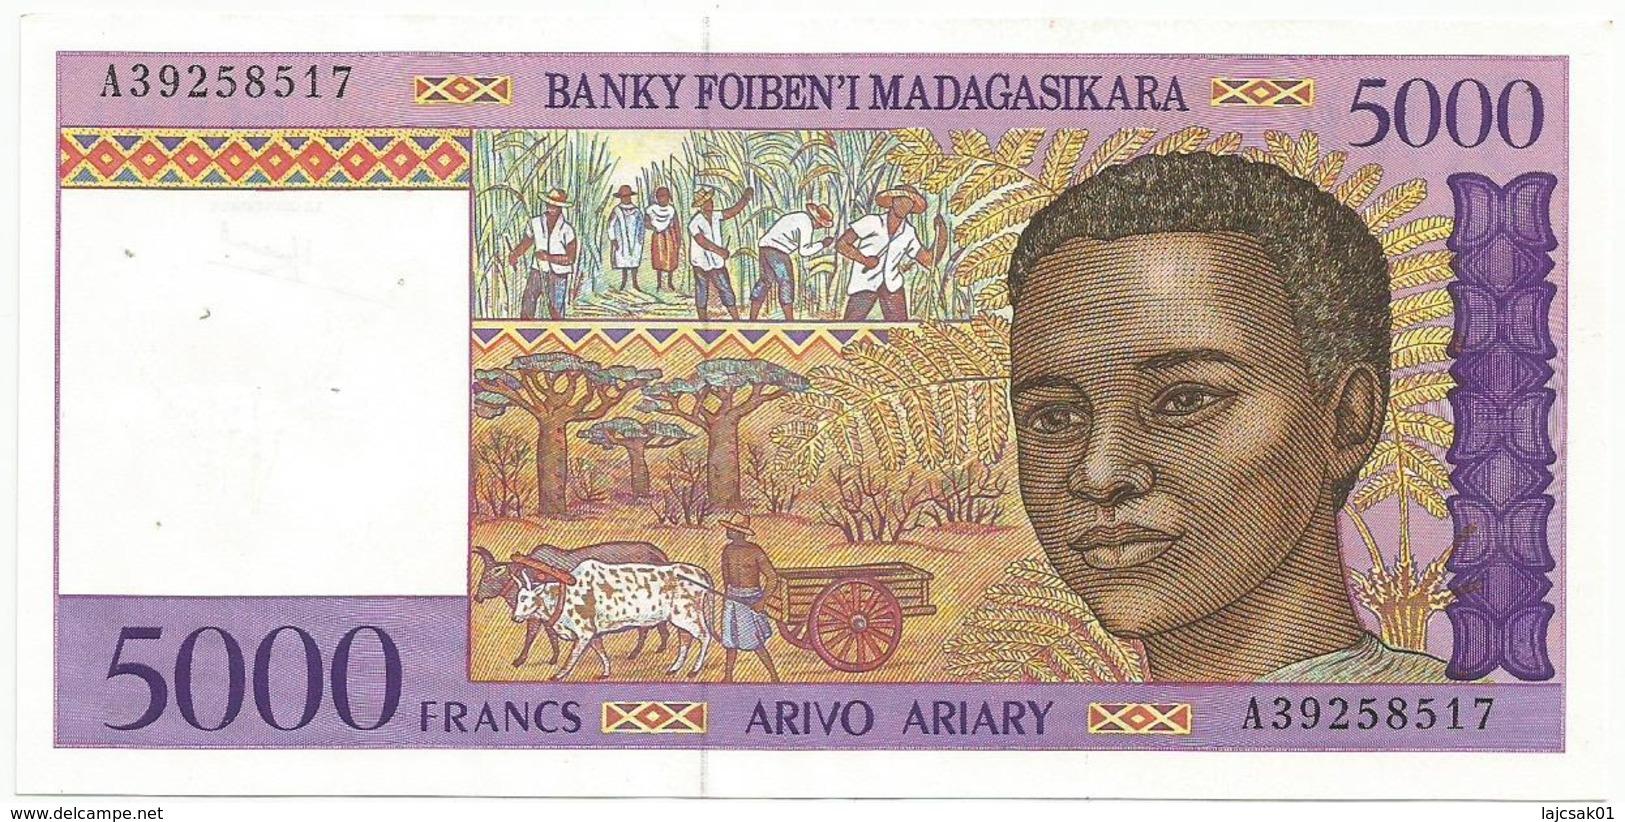 Madagascar 5000 Francs = 1000 Ariary 1994/95 ND - Madagascar